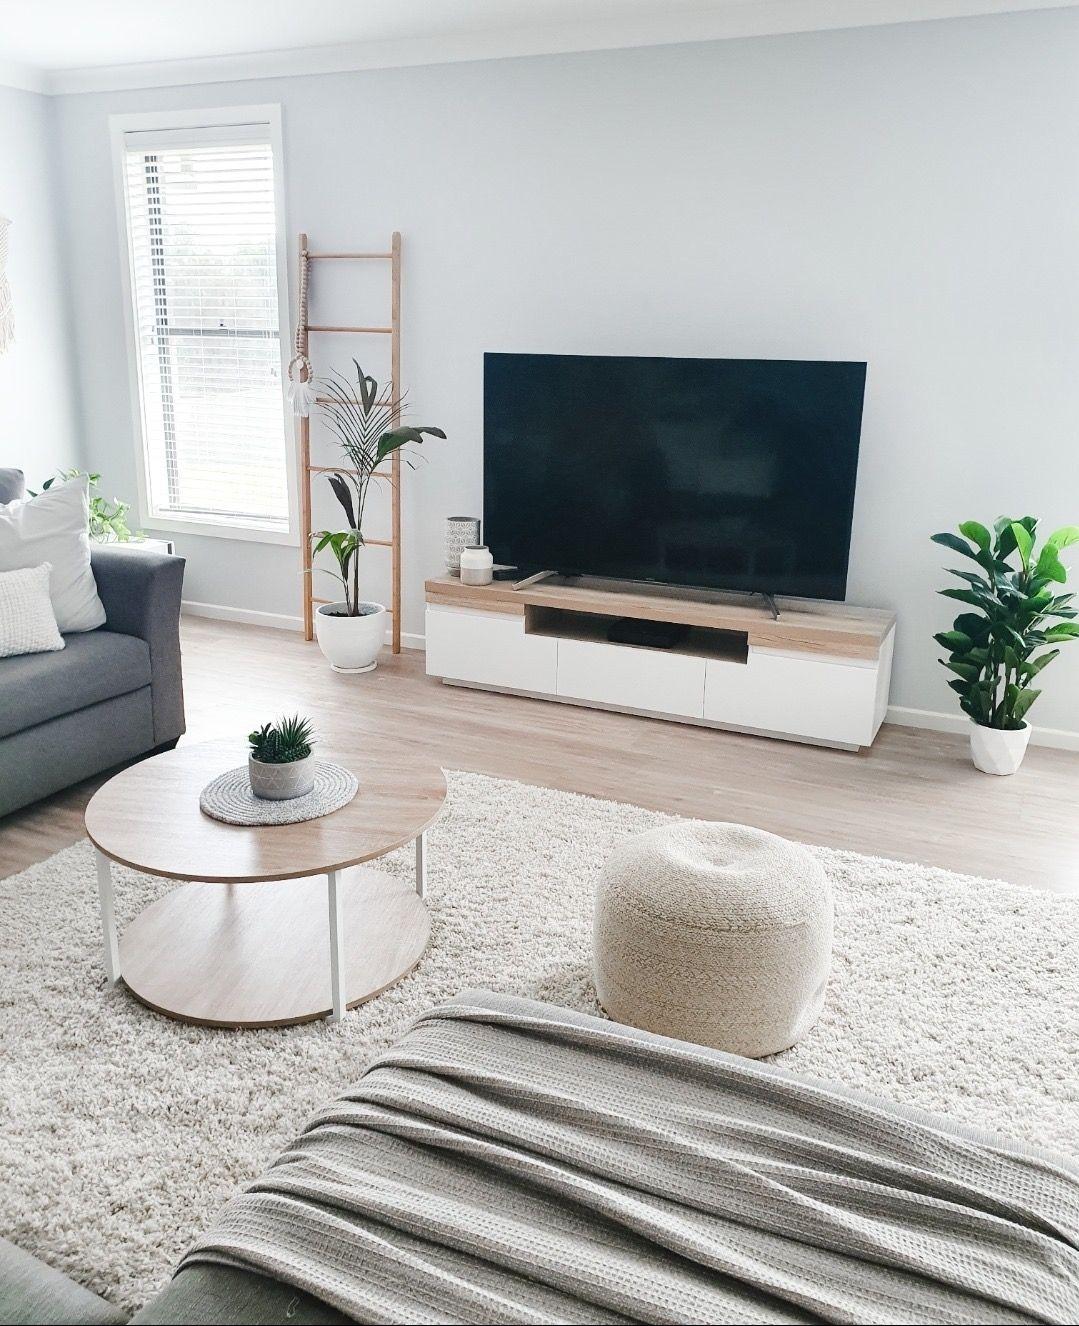 LOUNGE INSPO  Lounge room styling, Room inspiration bedroom